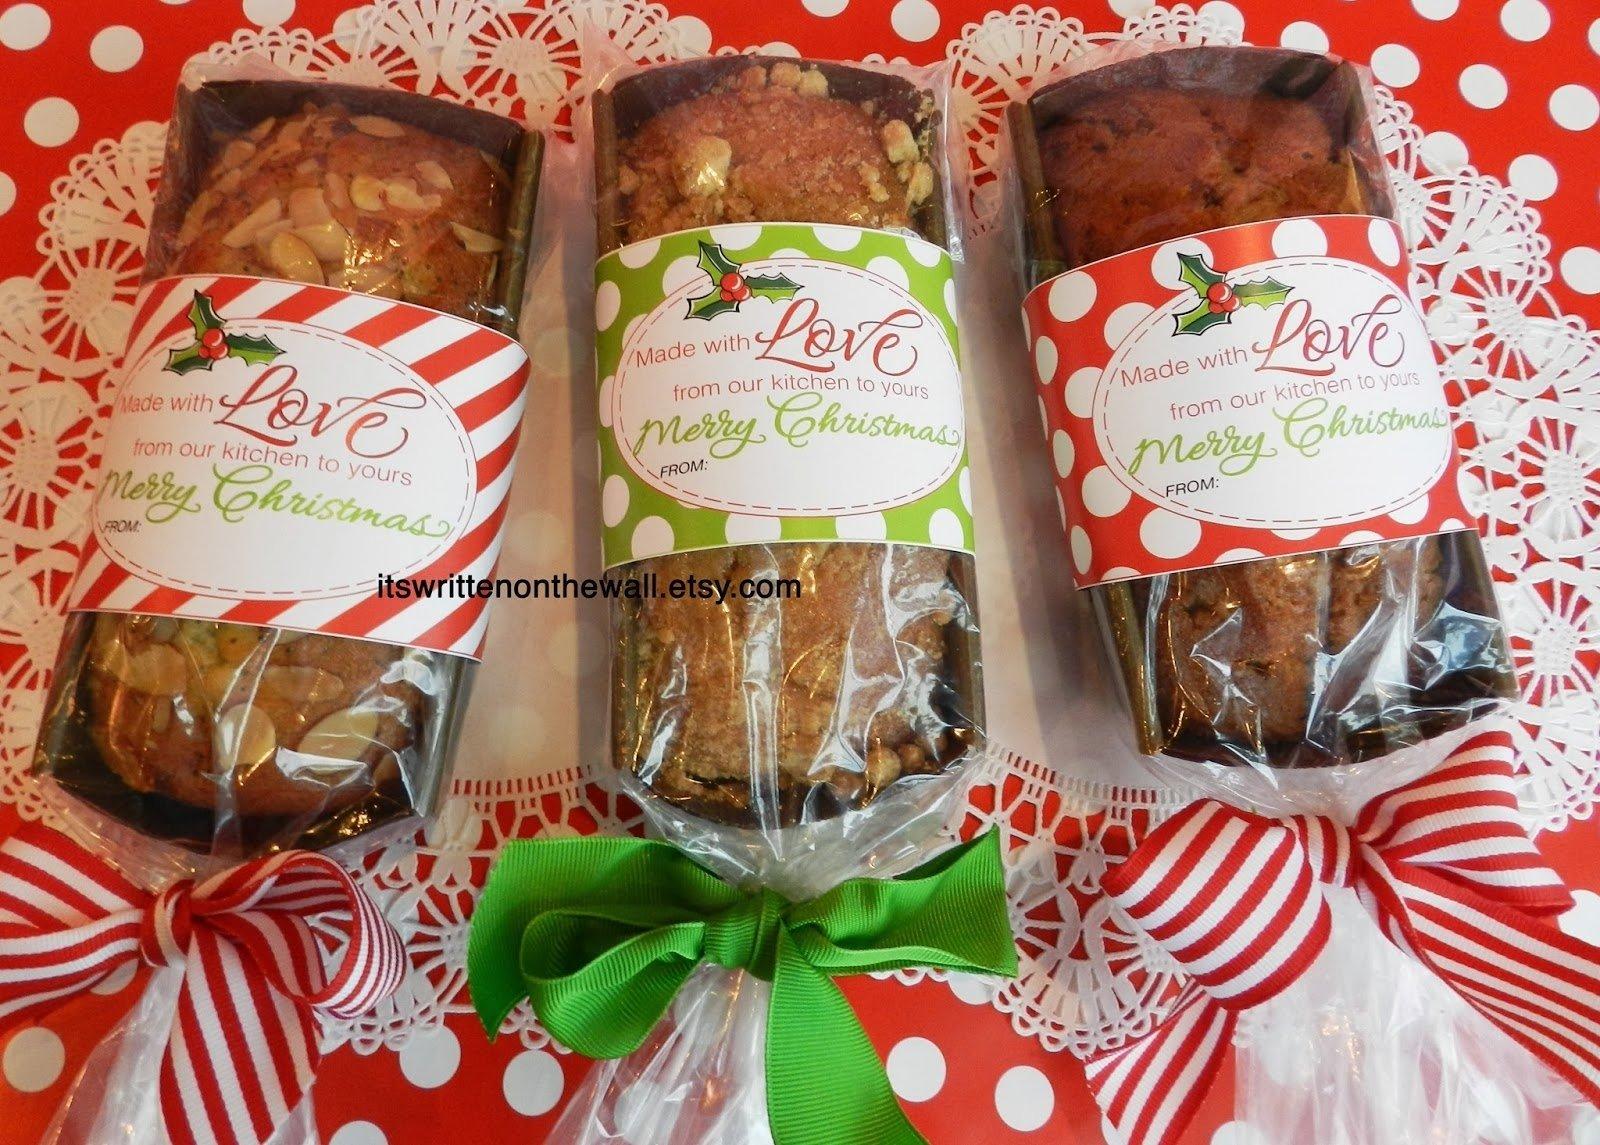 10 Elegant Food Gift Ideas For Christmas christmas gift ideas with others christmas food tag all 3 doilie 2020